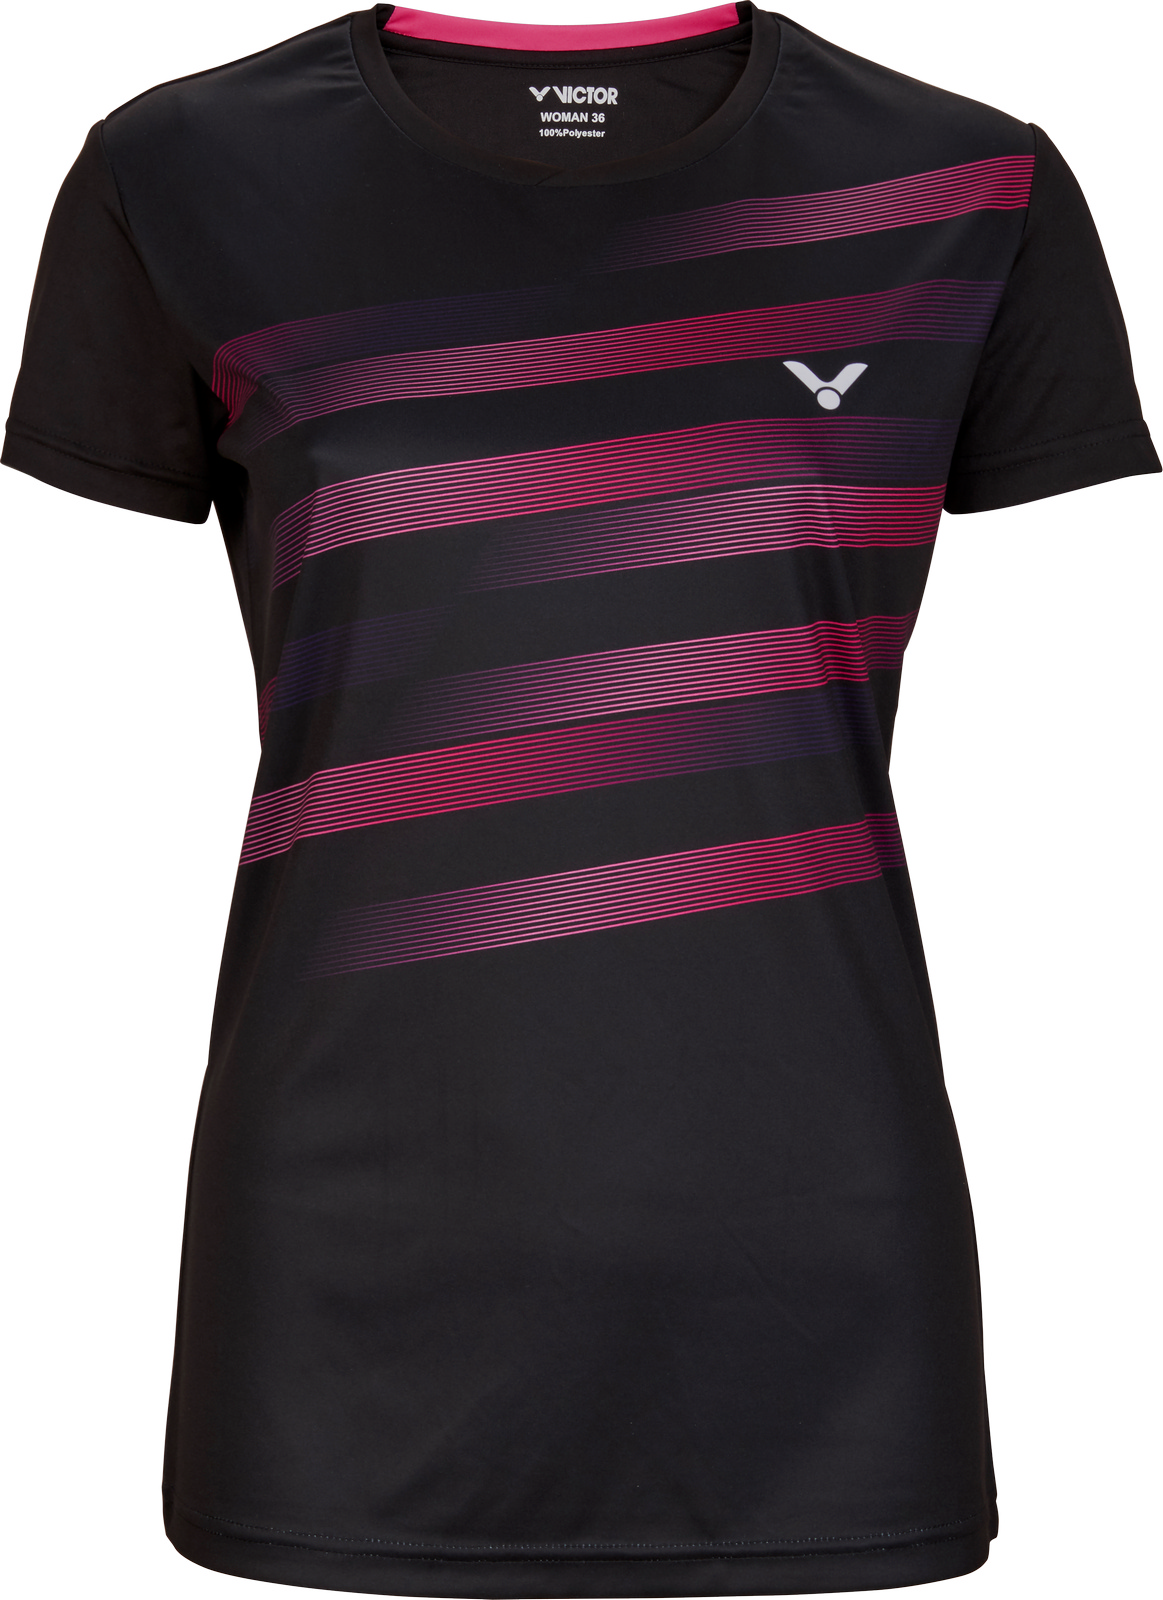 VICTOR T-Shirt T-04101 C